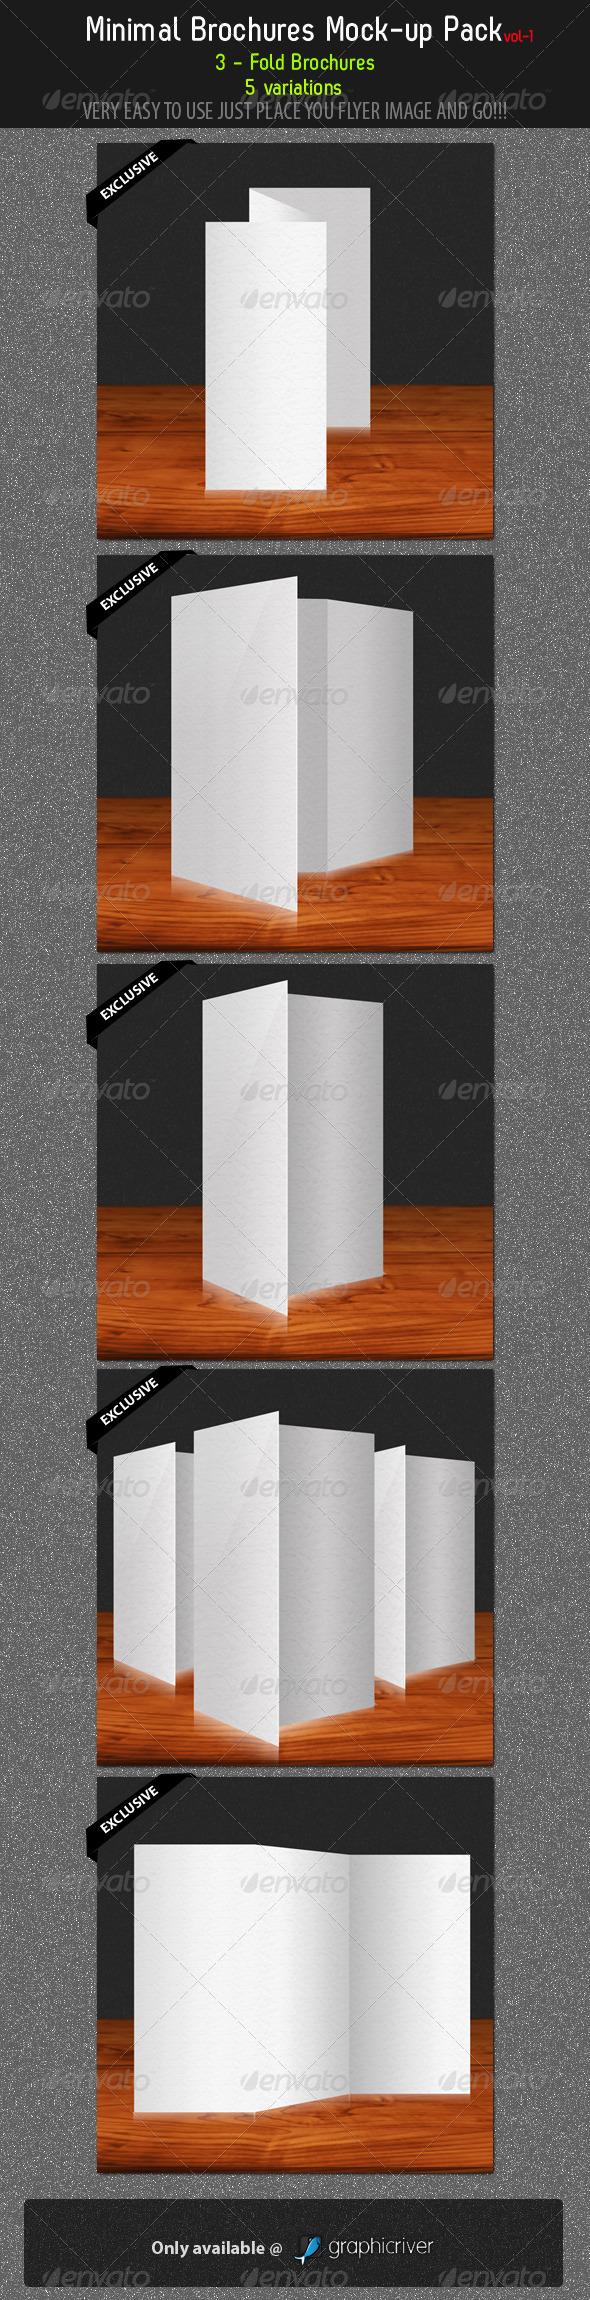 Minimal Brochures Mock-up Pack - 1 - Brochures Print